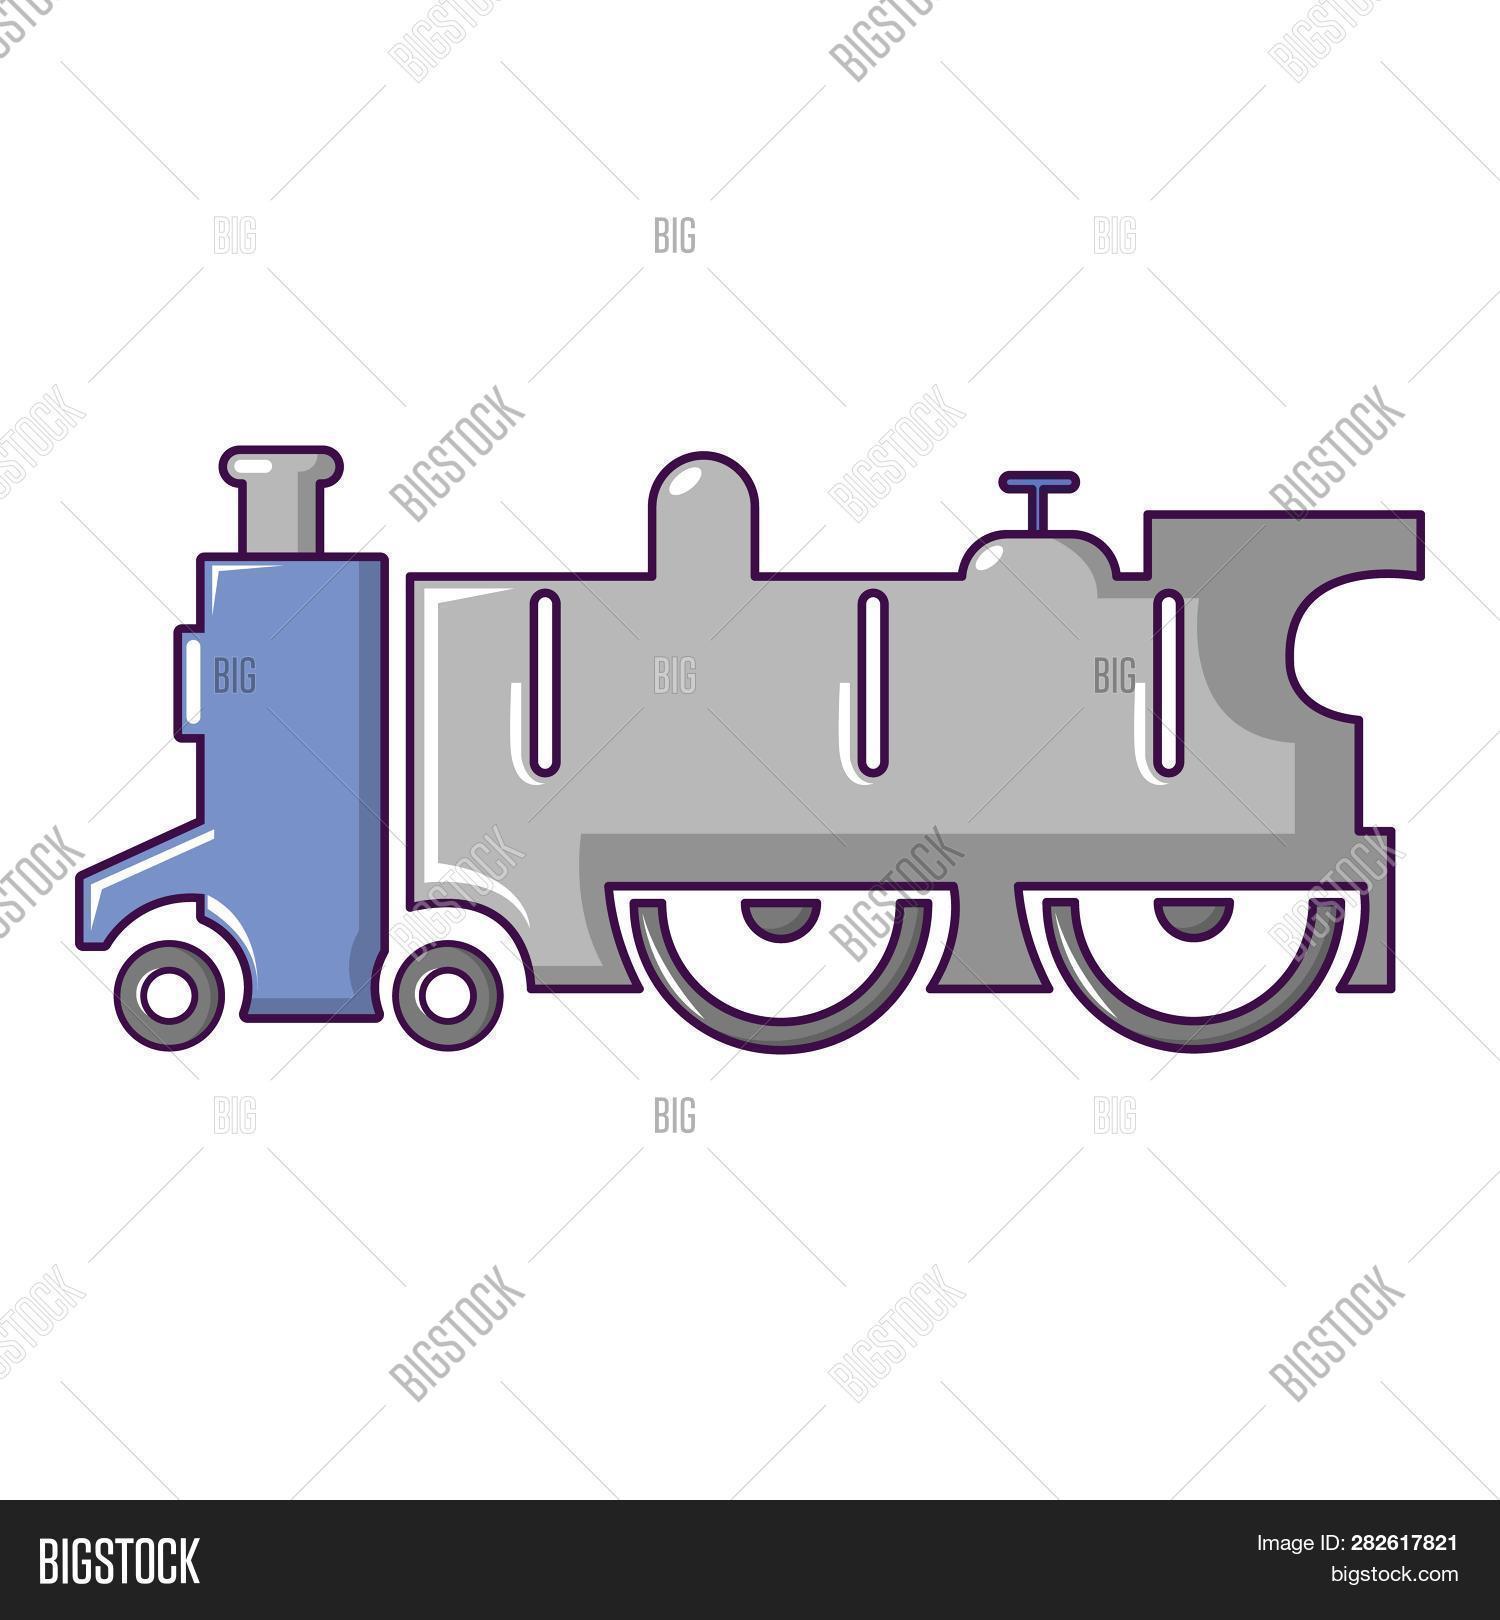 Old Steam Locomotive Image & Photo (Free Trial) | Bigstock